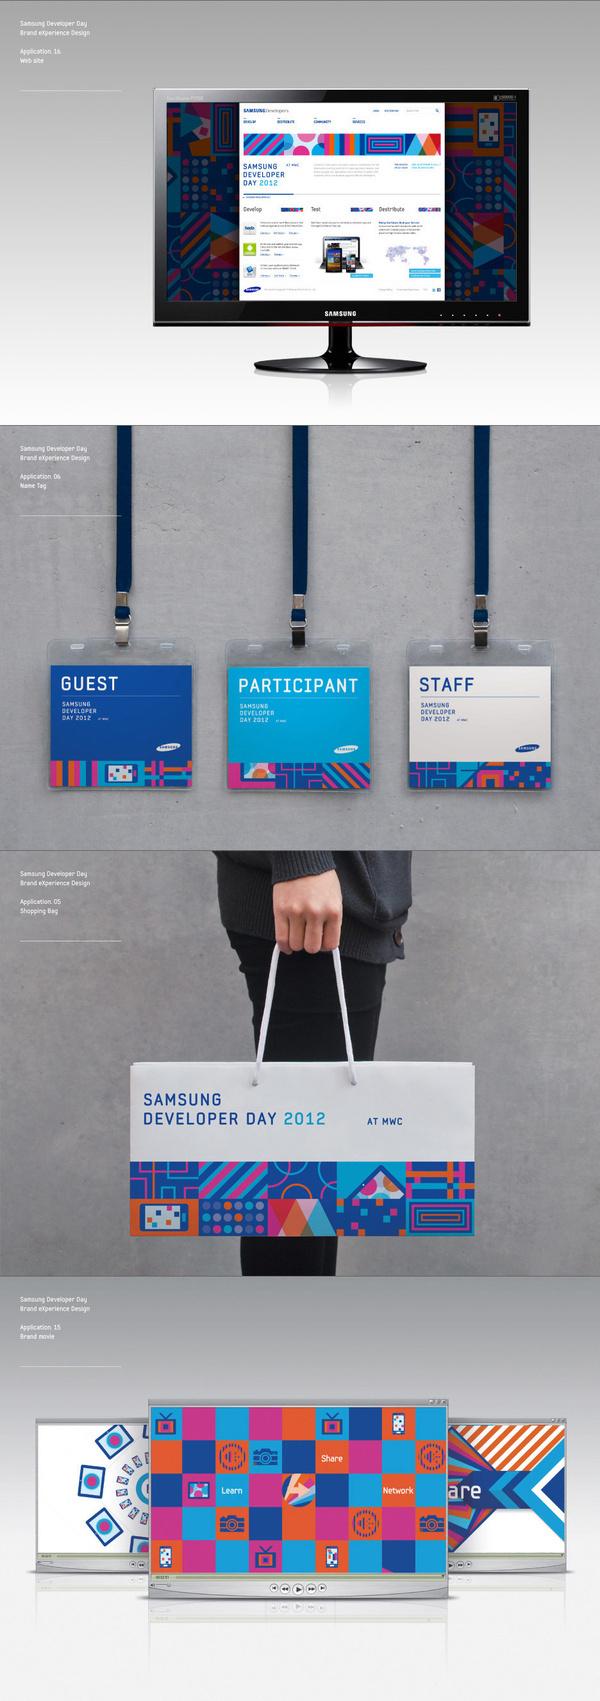 Samsung Developers Brand eXperience Design on Behance #11